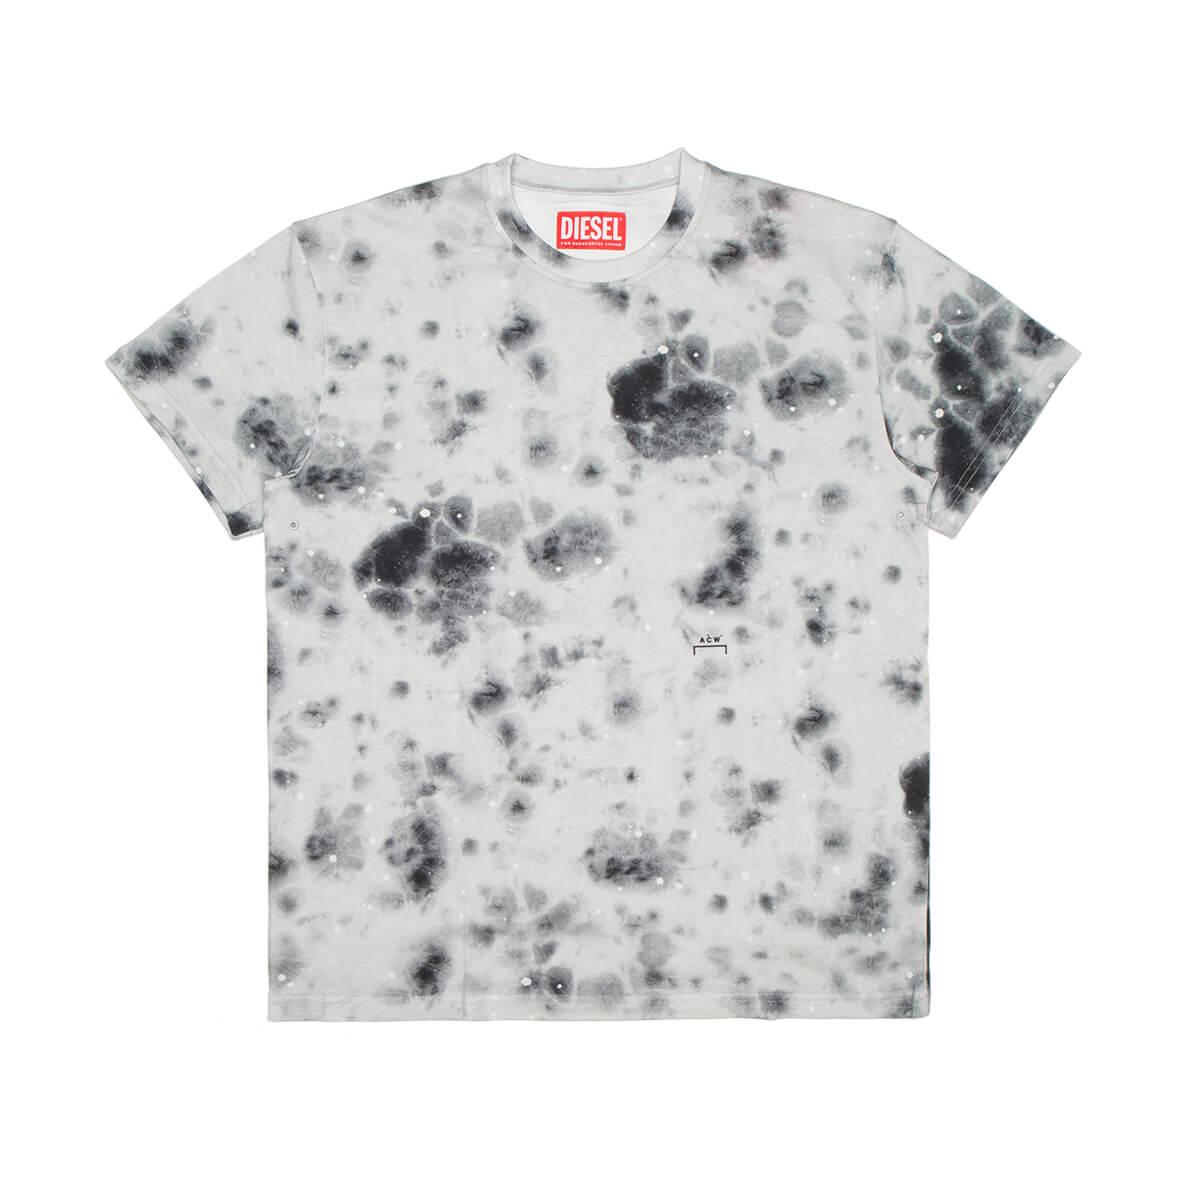 Diesel Stain Print T-shirt